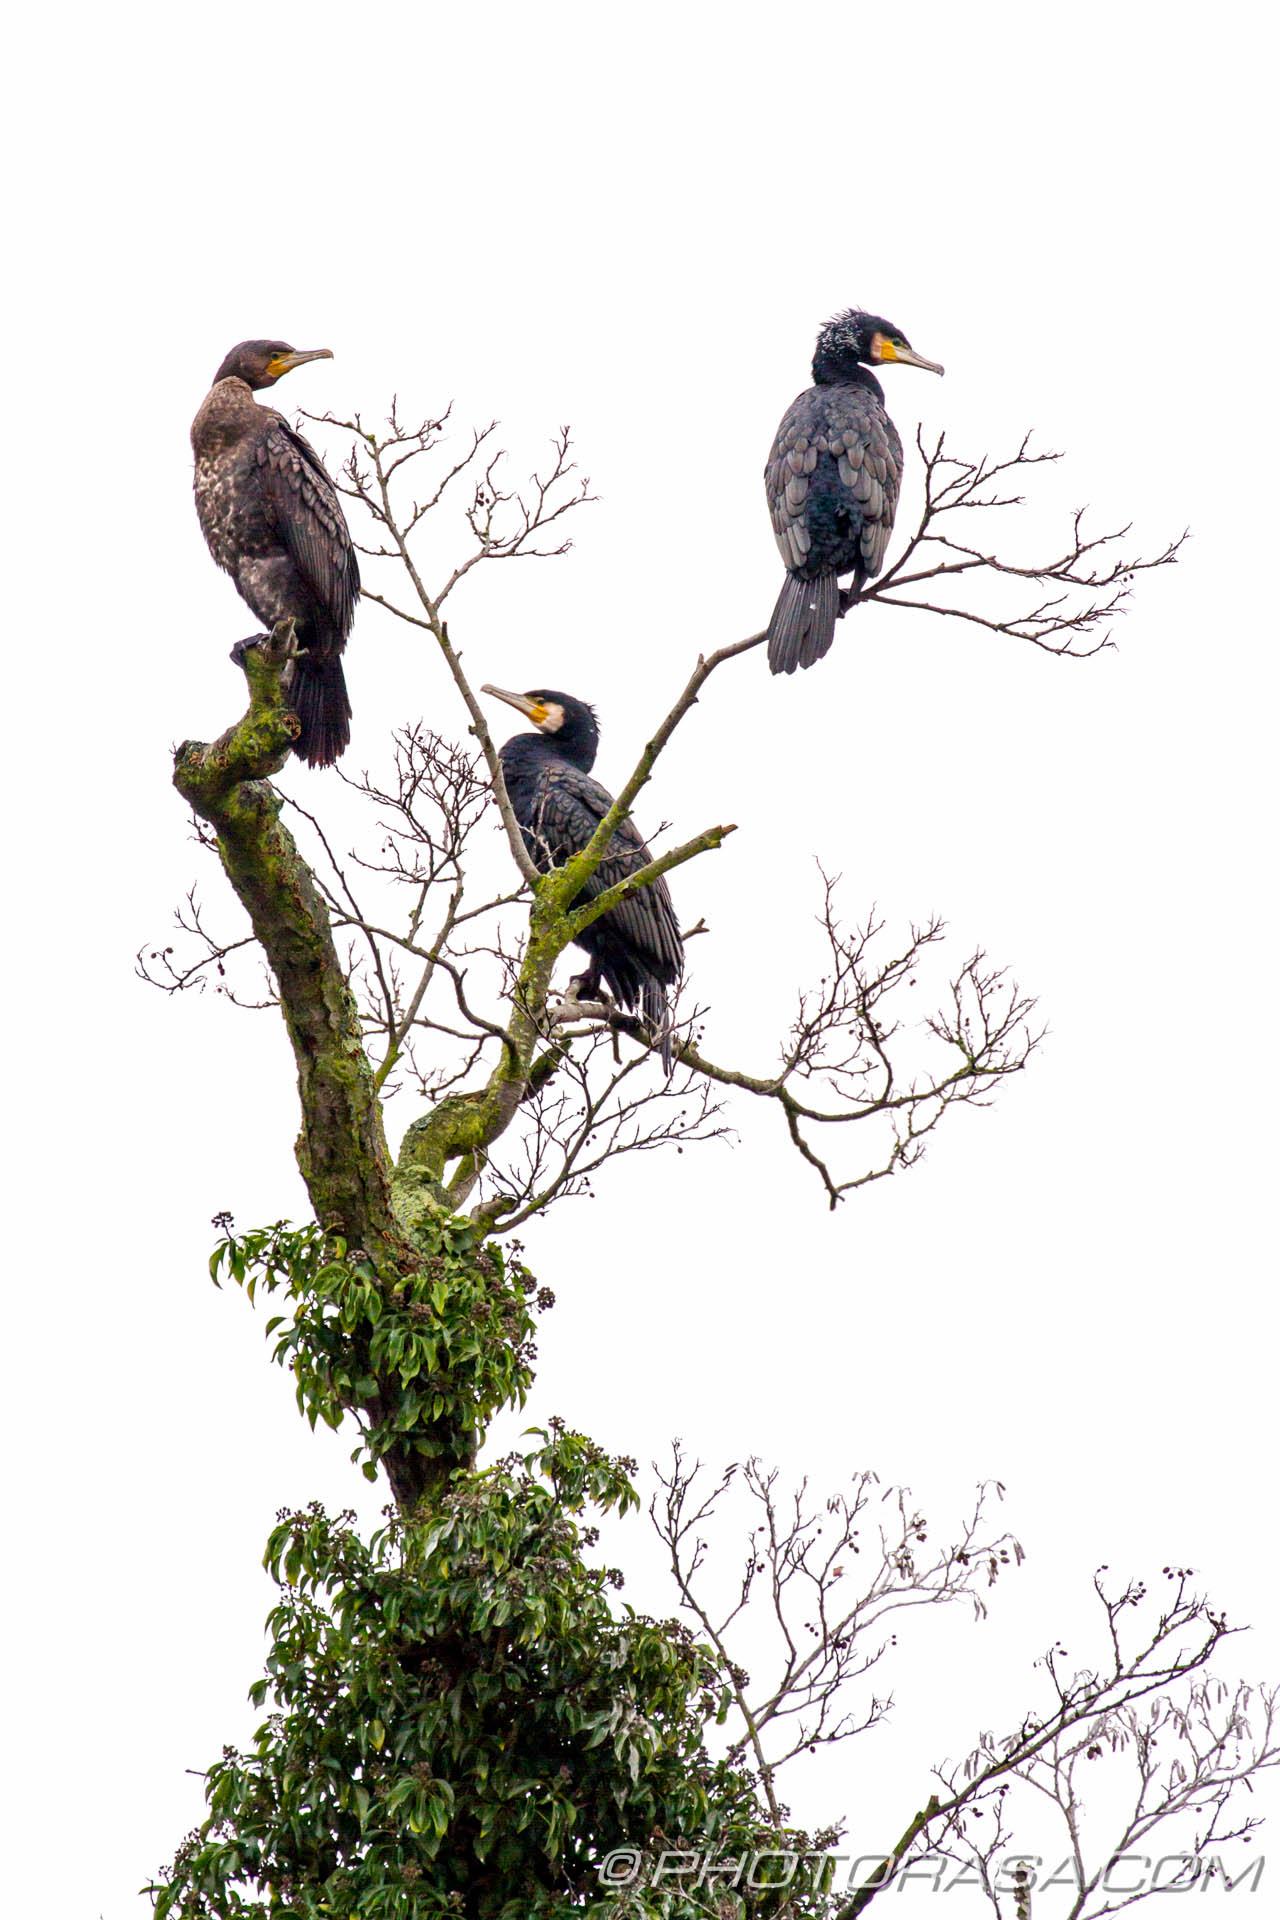 http://photorasa.com/three-cormorants/three-big-birds-up-a-tree/